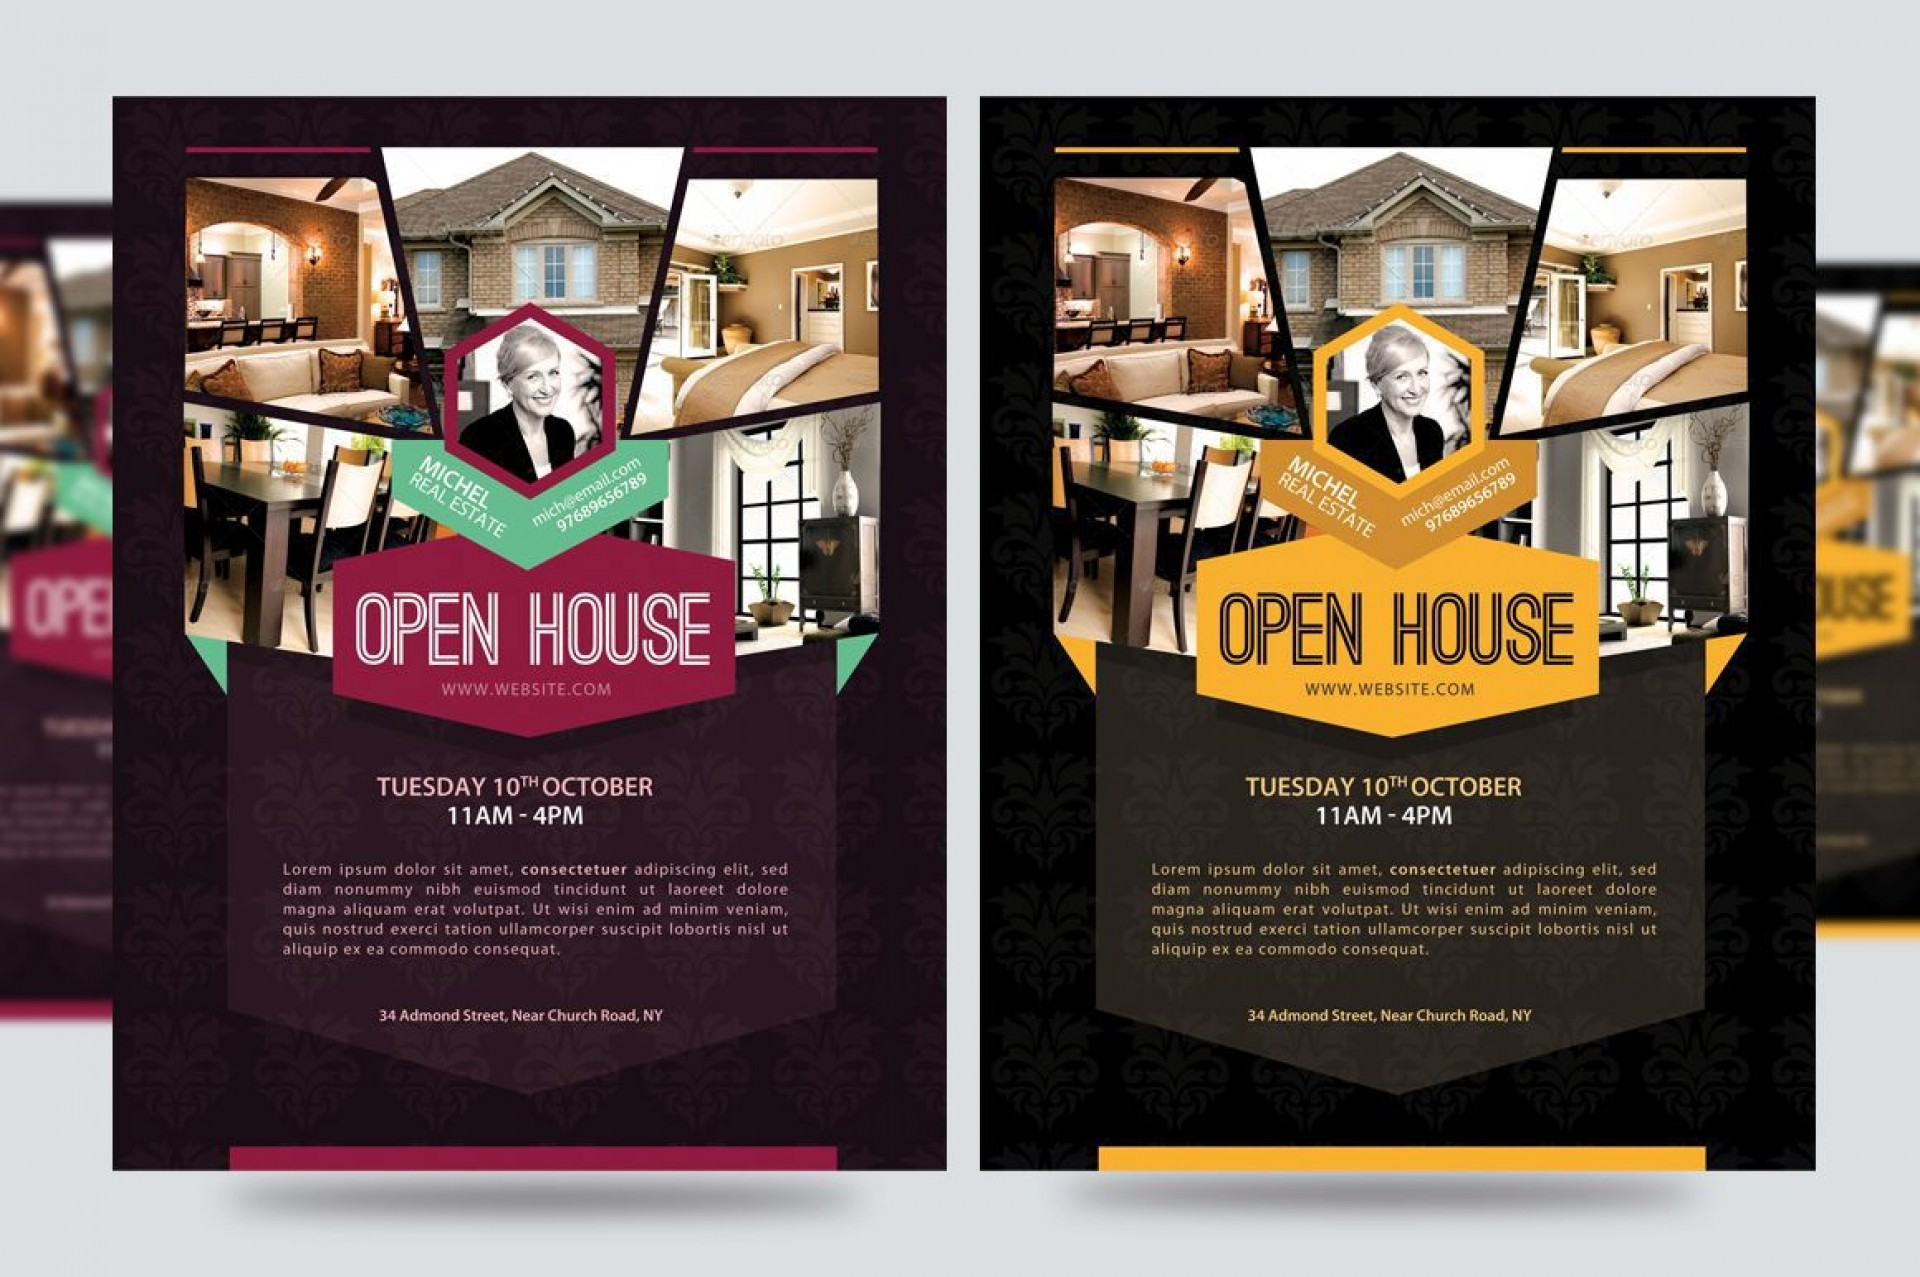 003 Exceptional Open House Flyer Template Free High Def  School Microsoft Word Preschool1920